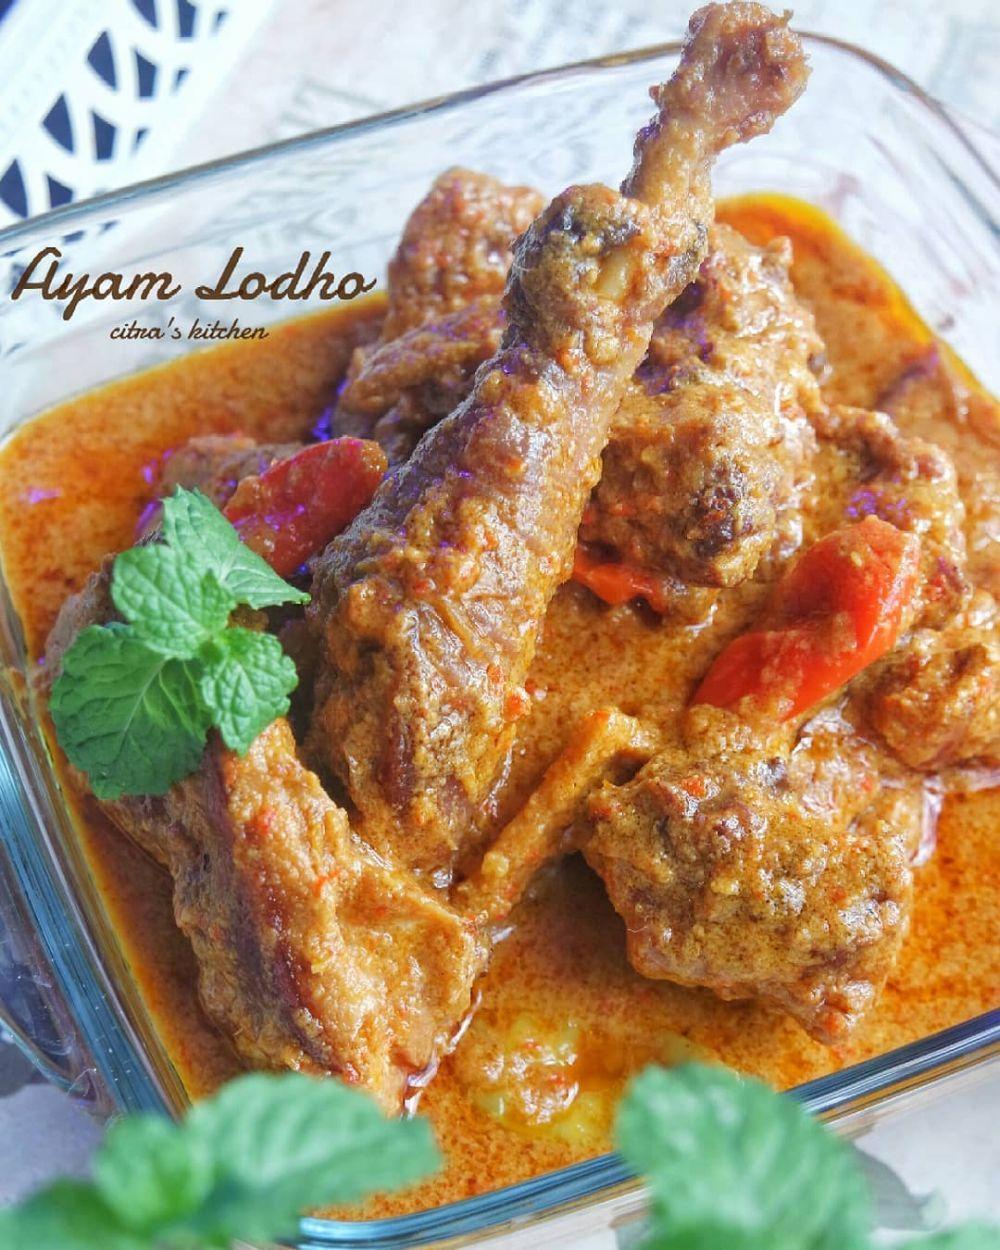 20 Resep Masakan Ayam Paling Enak Instagram Resep Ayam Resep Masakan Resep Sayap Ayam